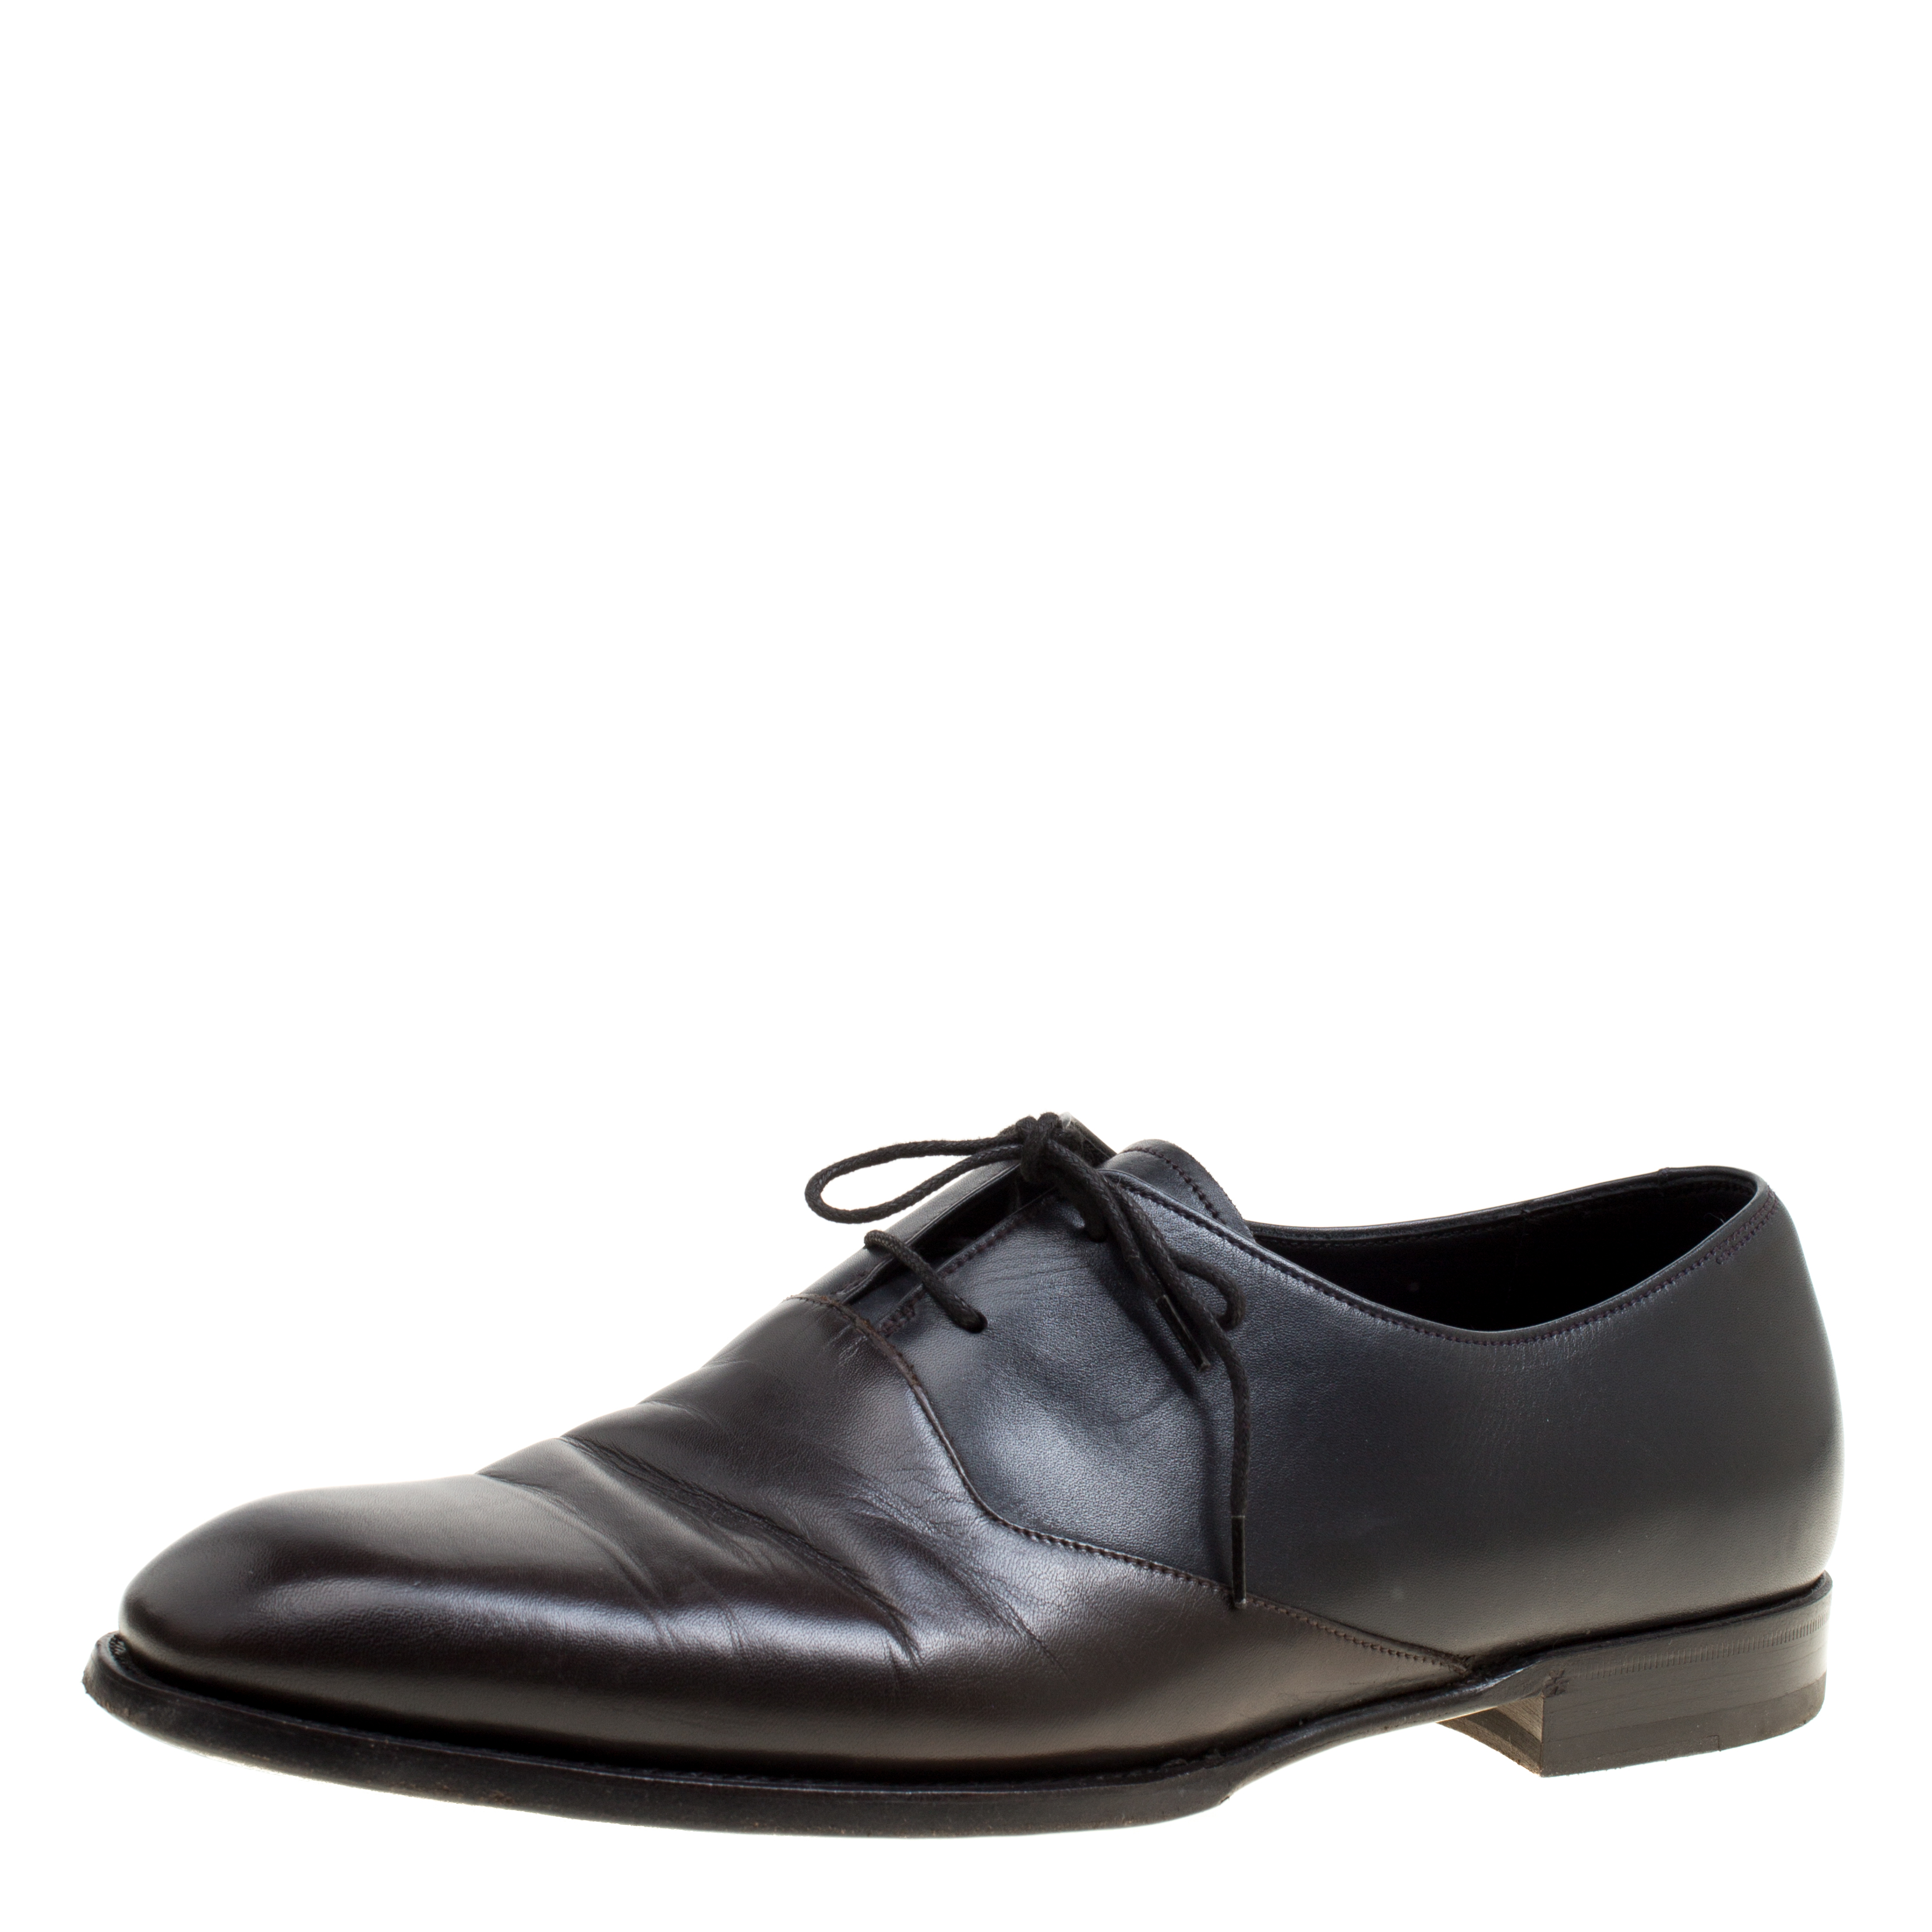 Bottega Veneta Black/Brown Leather Oxfords Size 42